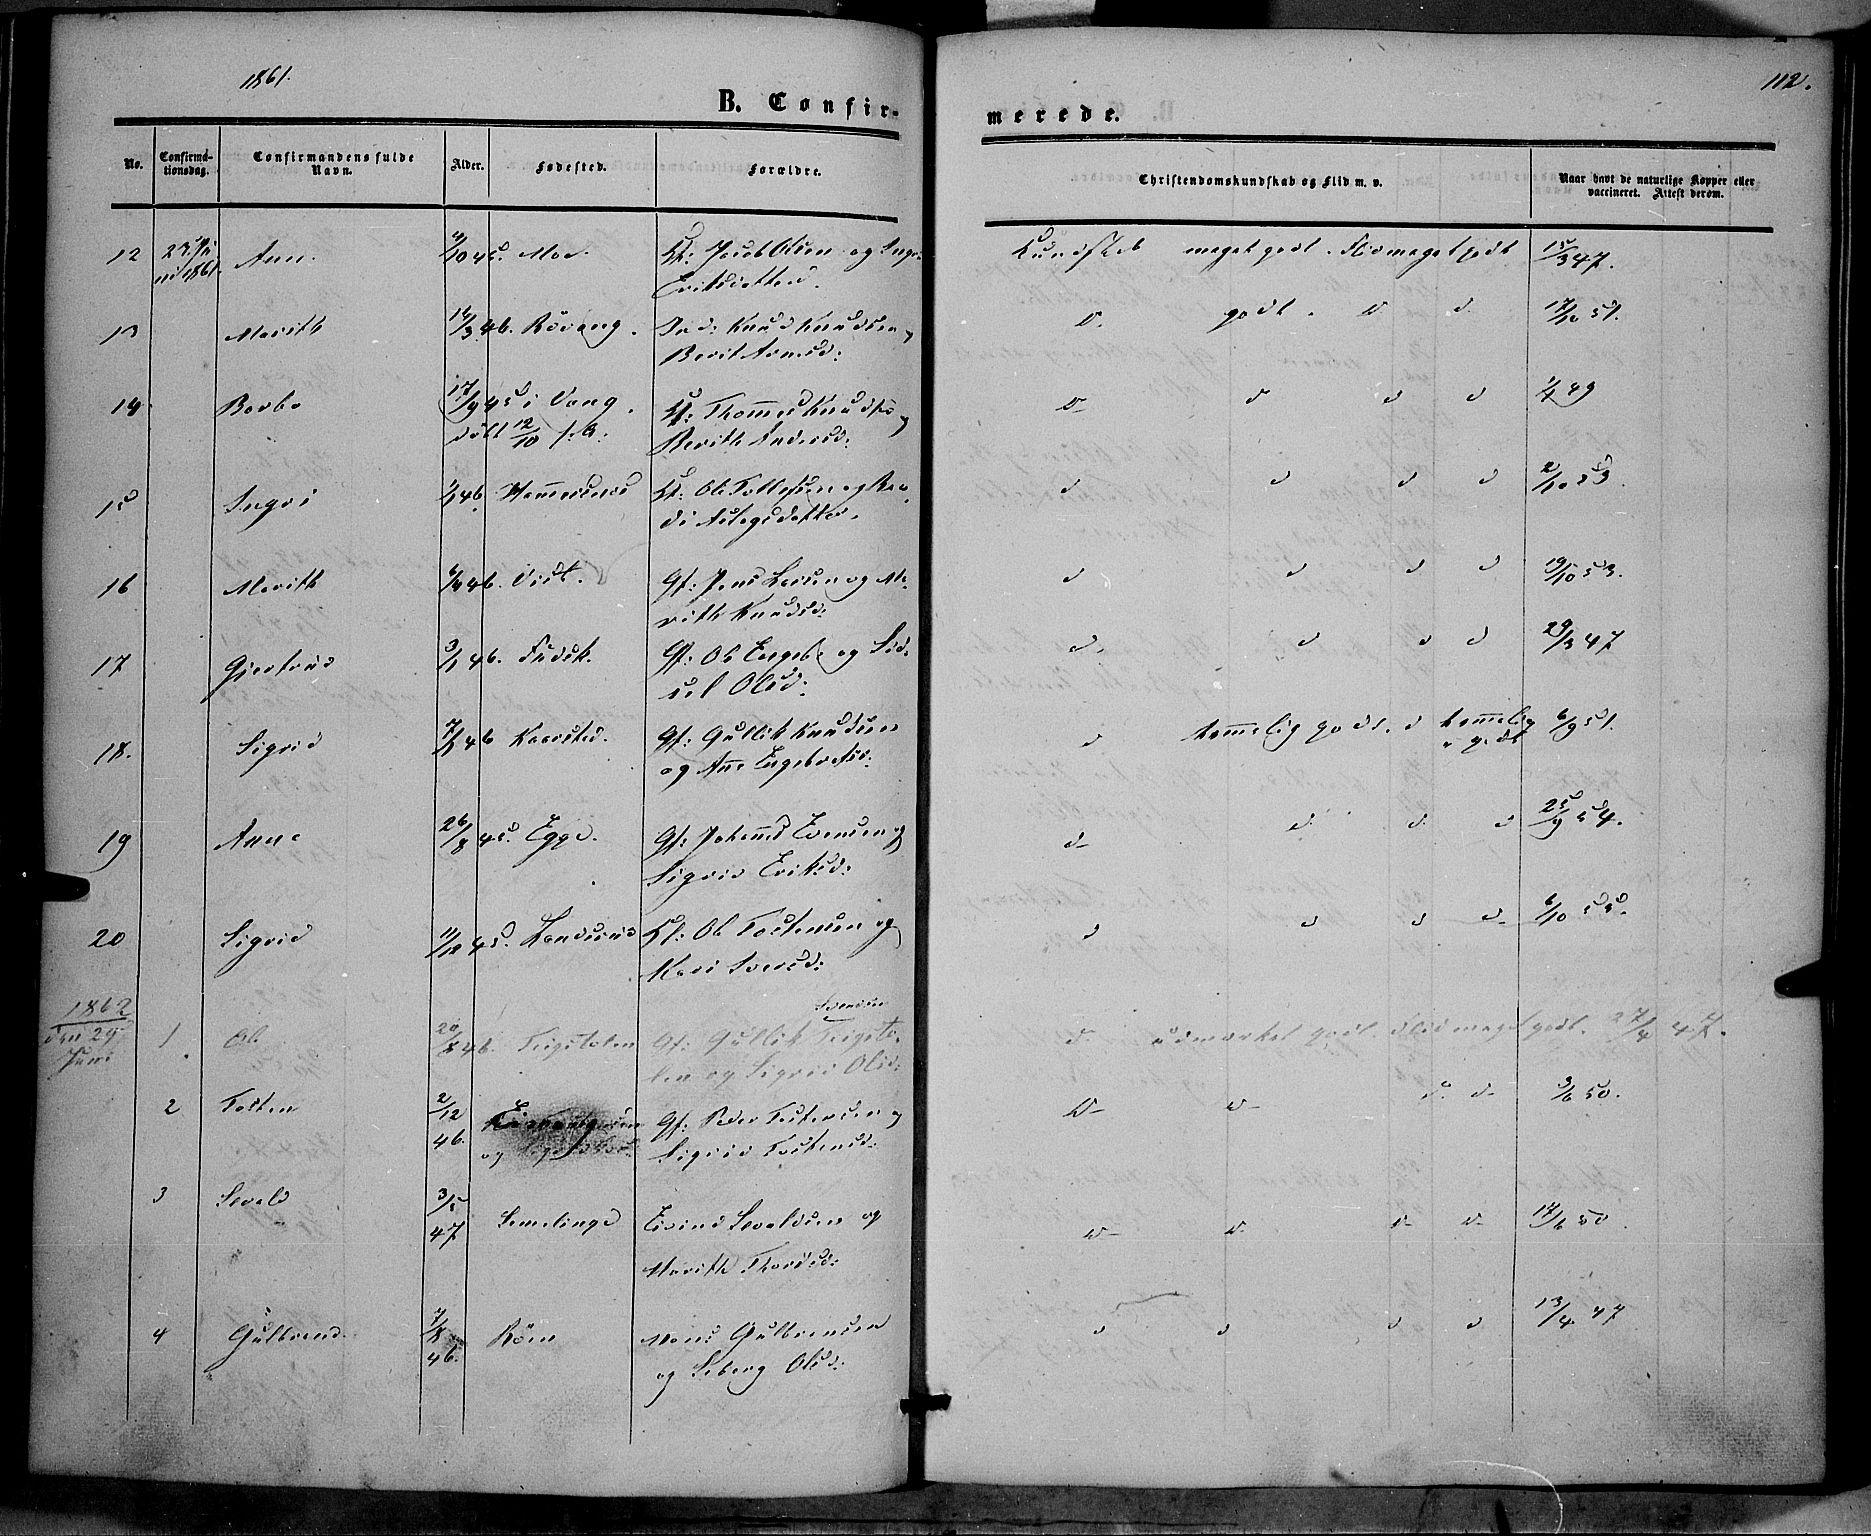 SAH, Vestre Slidre prestekontor, Ministerialbok nr. 2, 1856-1864, s. 112